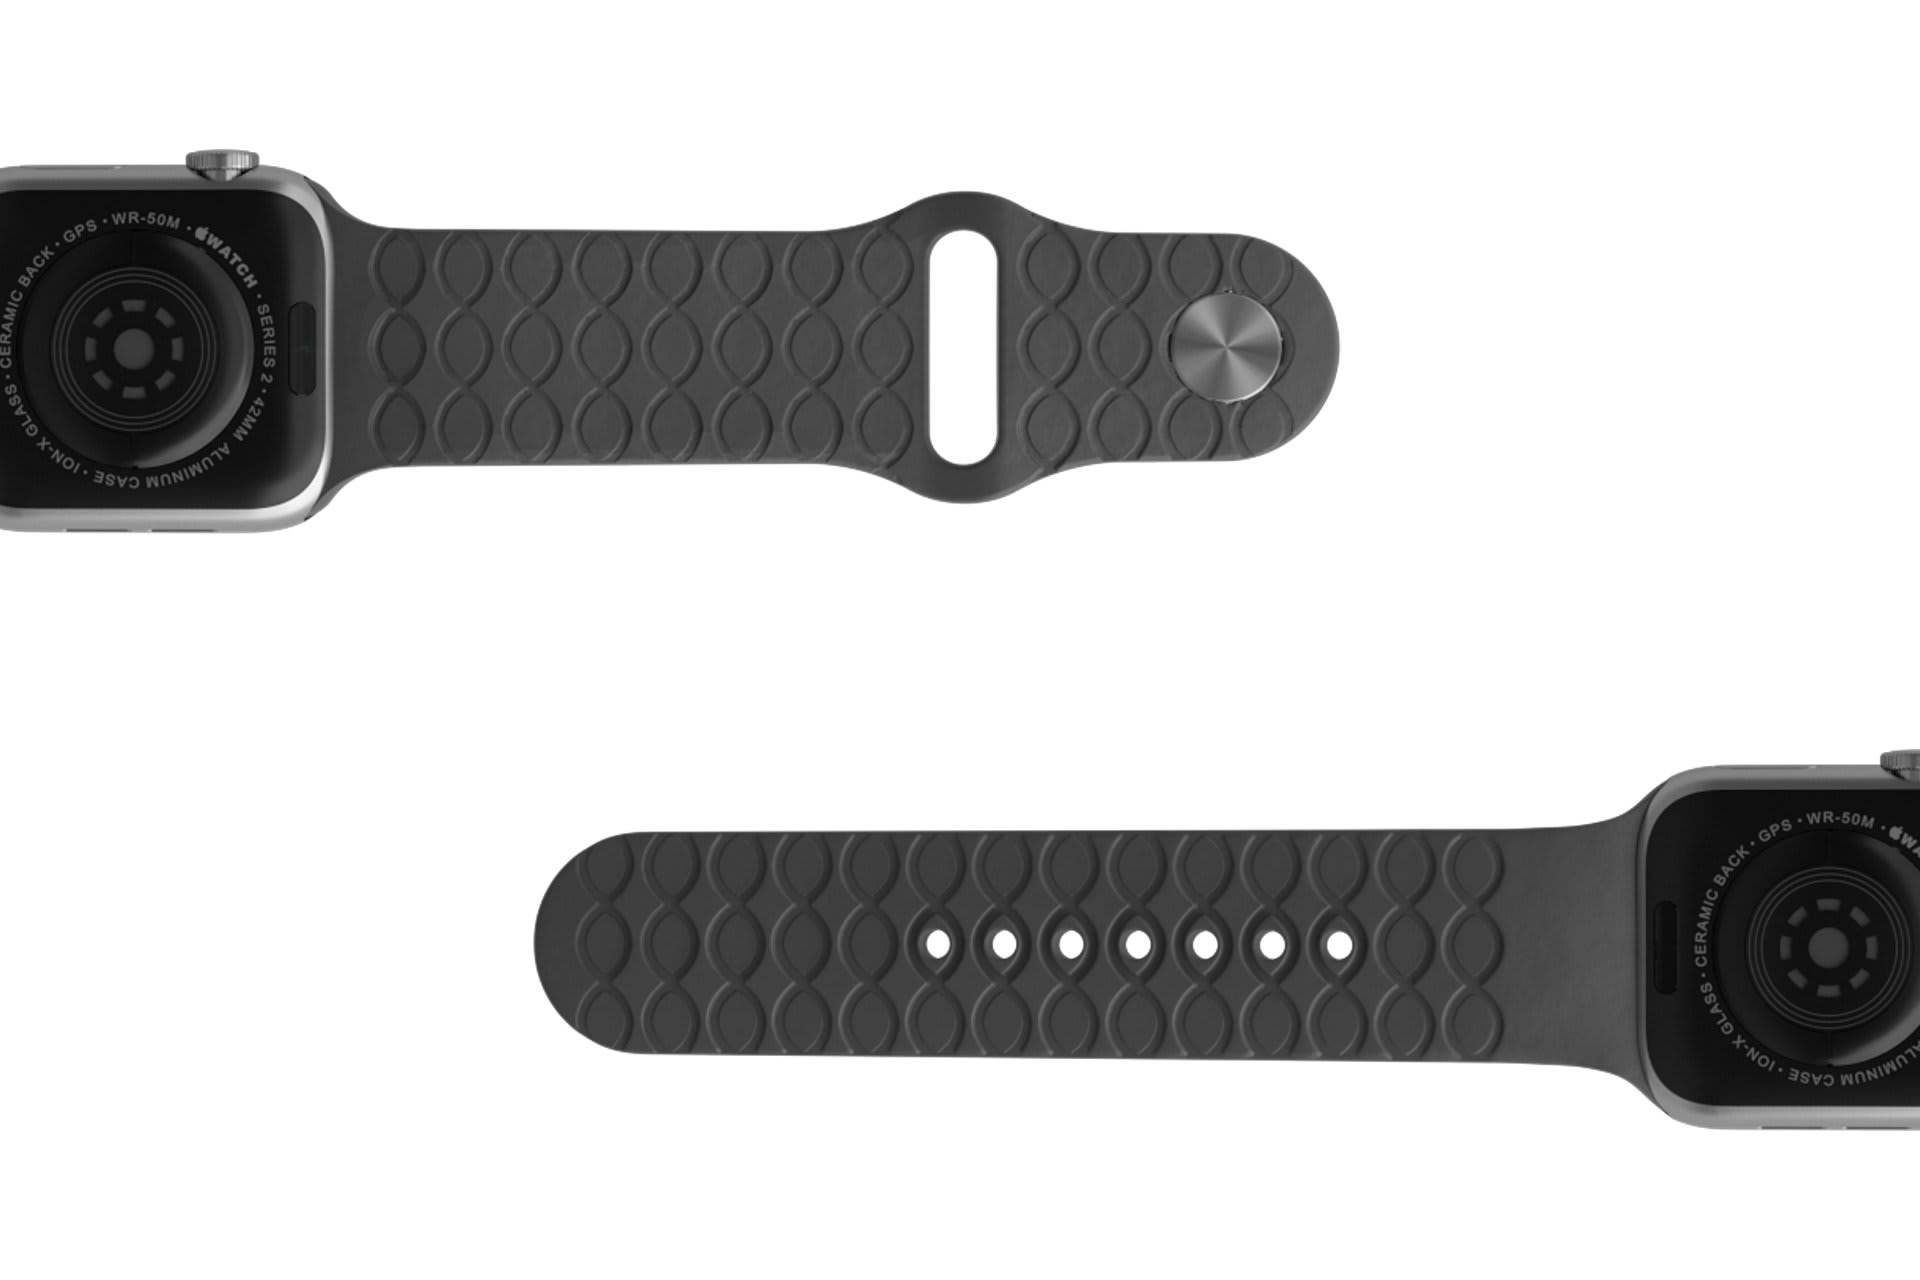 Dimension Kryptek Etch Deep Stone Grey  Apple   watch band with silver hardware viewed bottom up